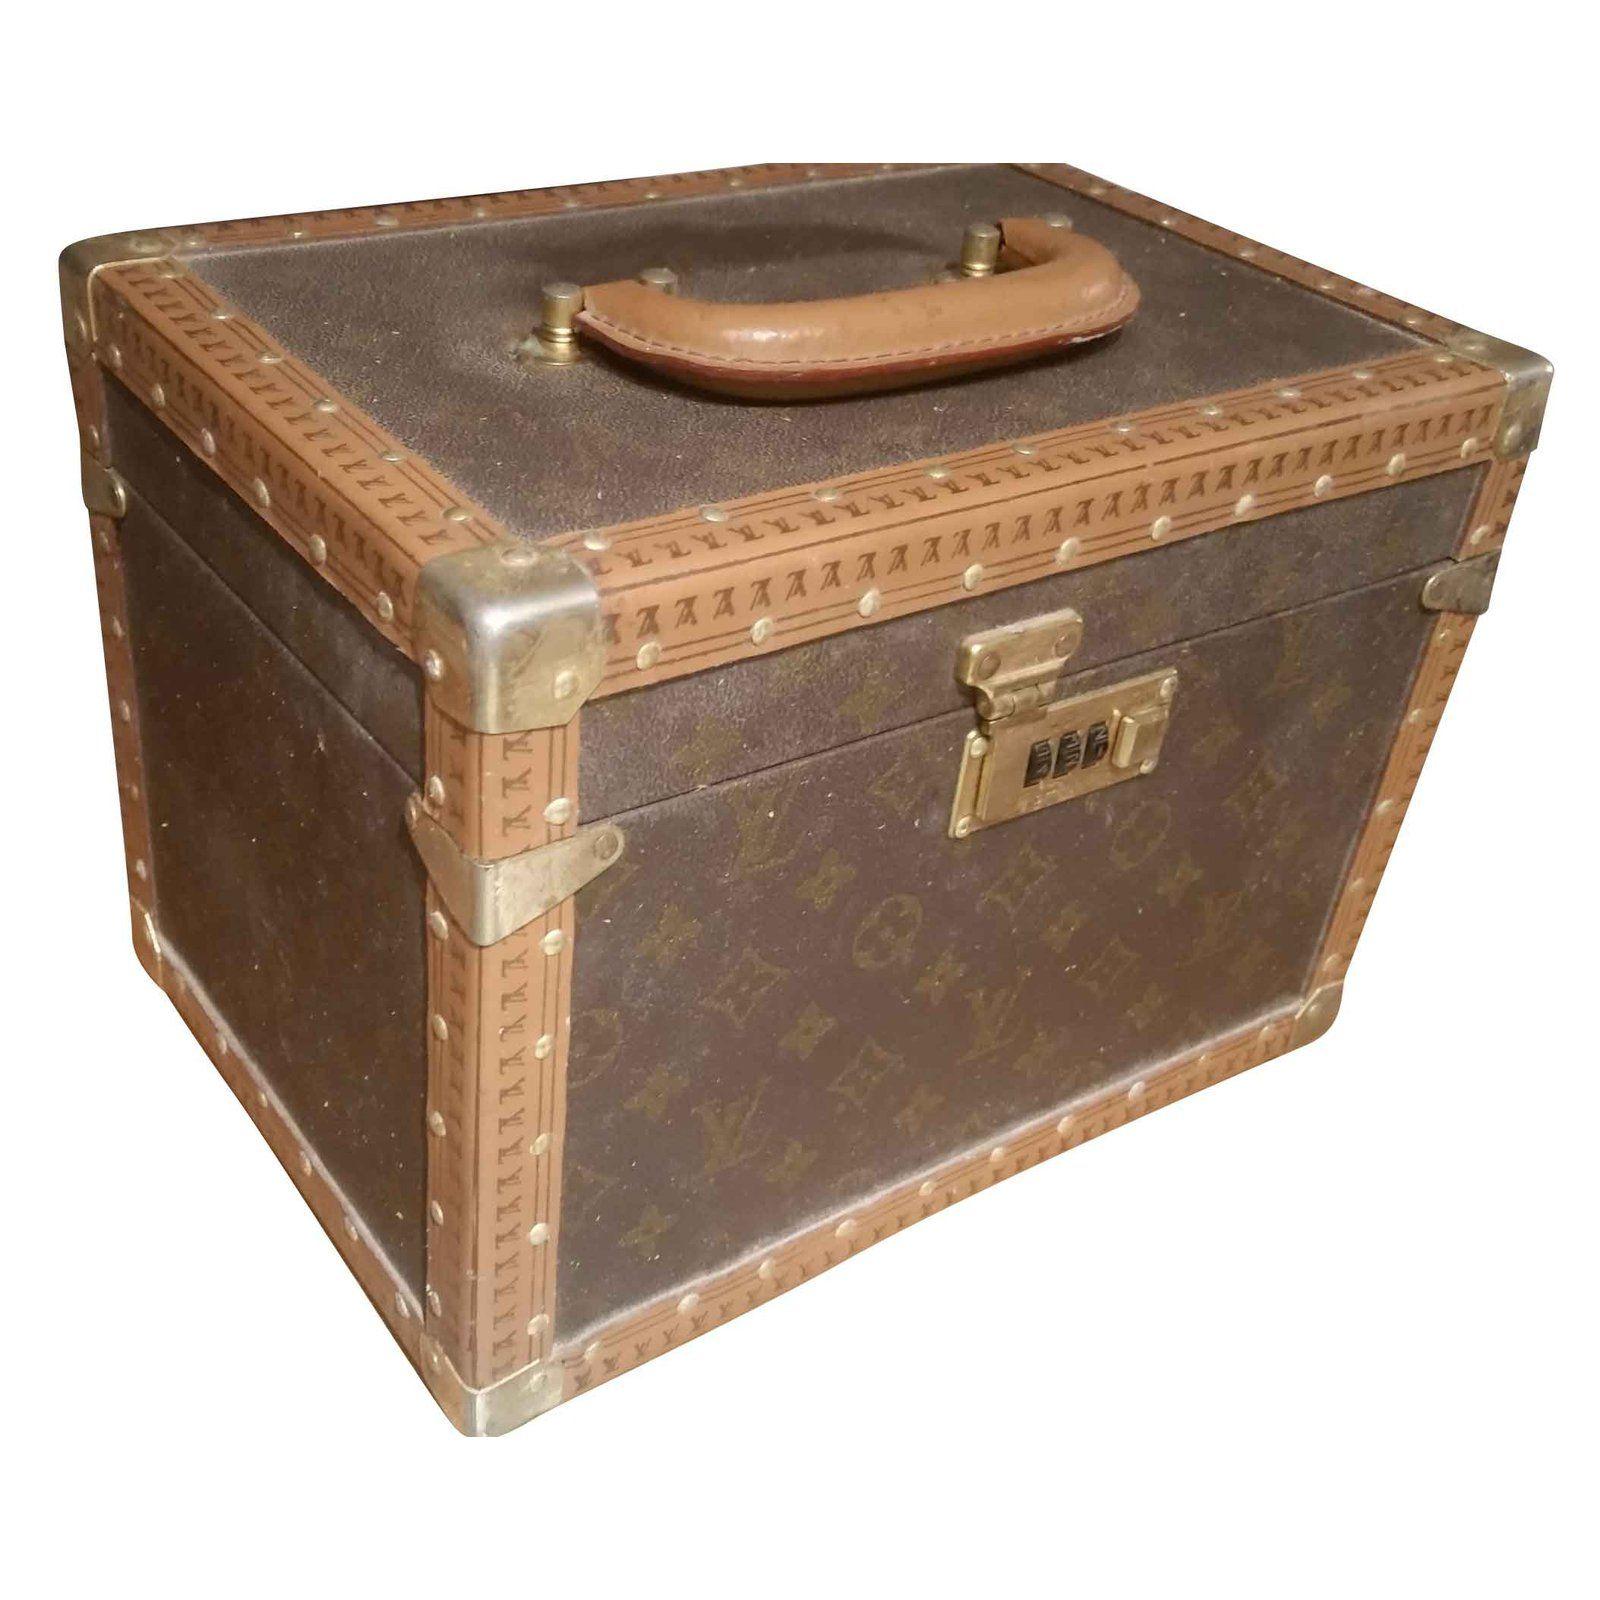 Vanity Case Louis Vuitton Maroquinerie Vanity Case Louis Vuitton